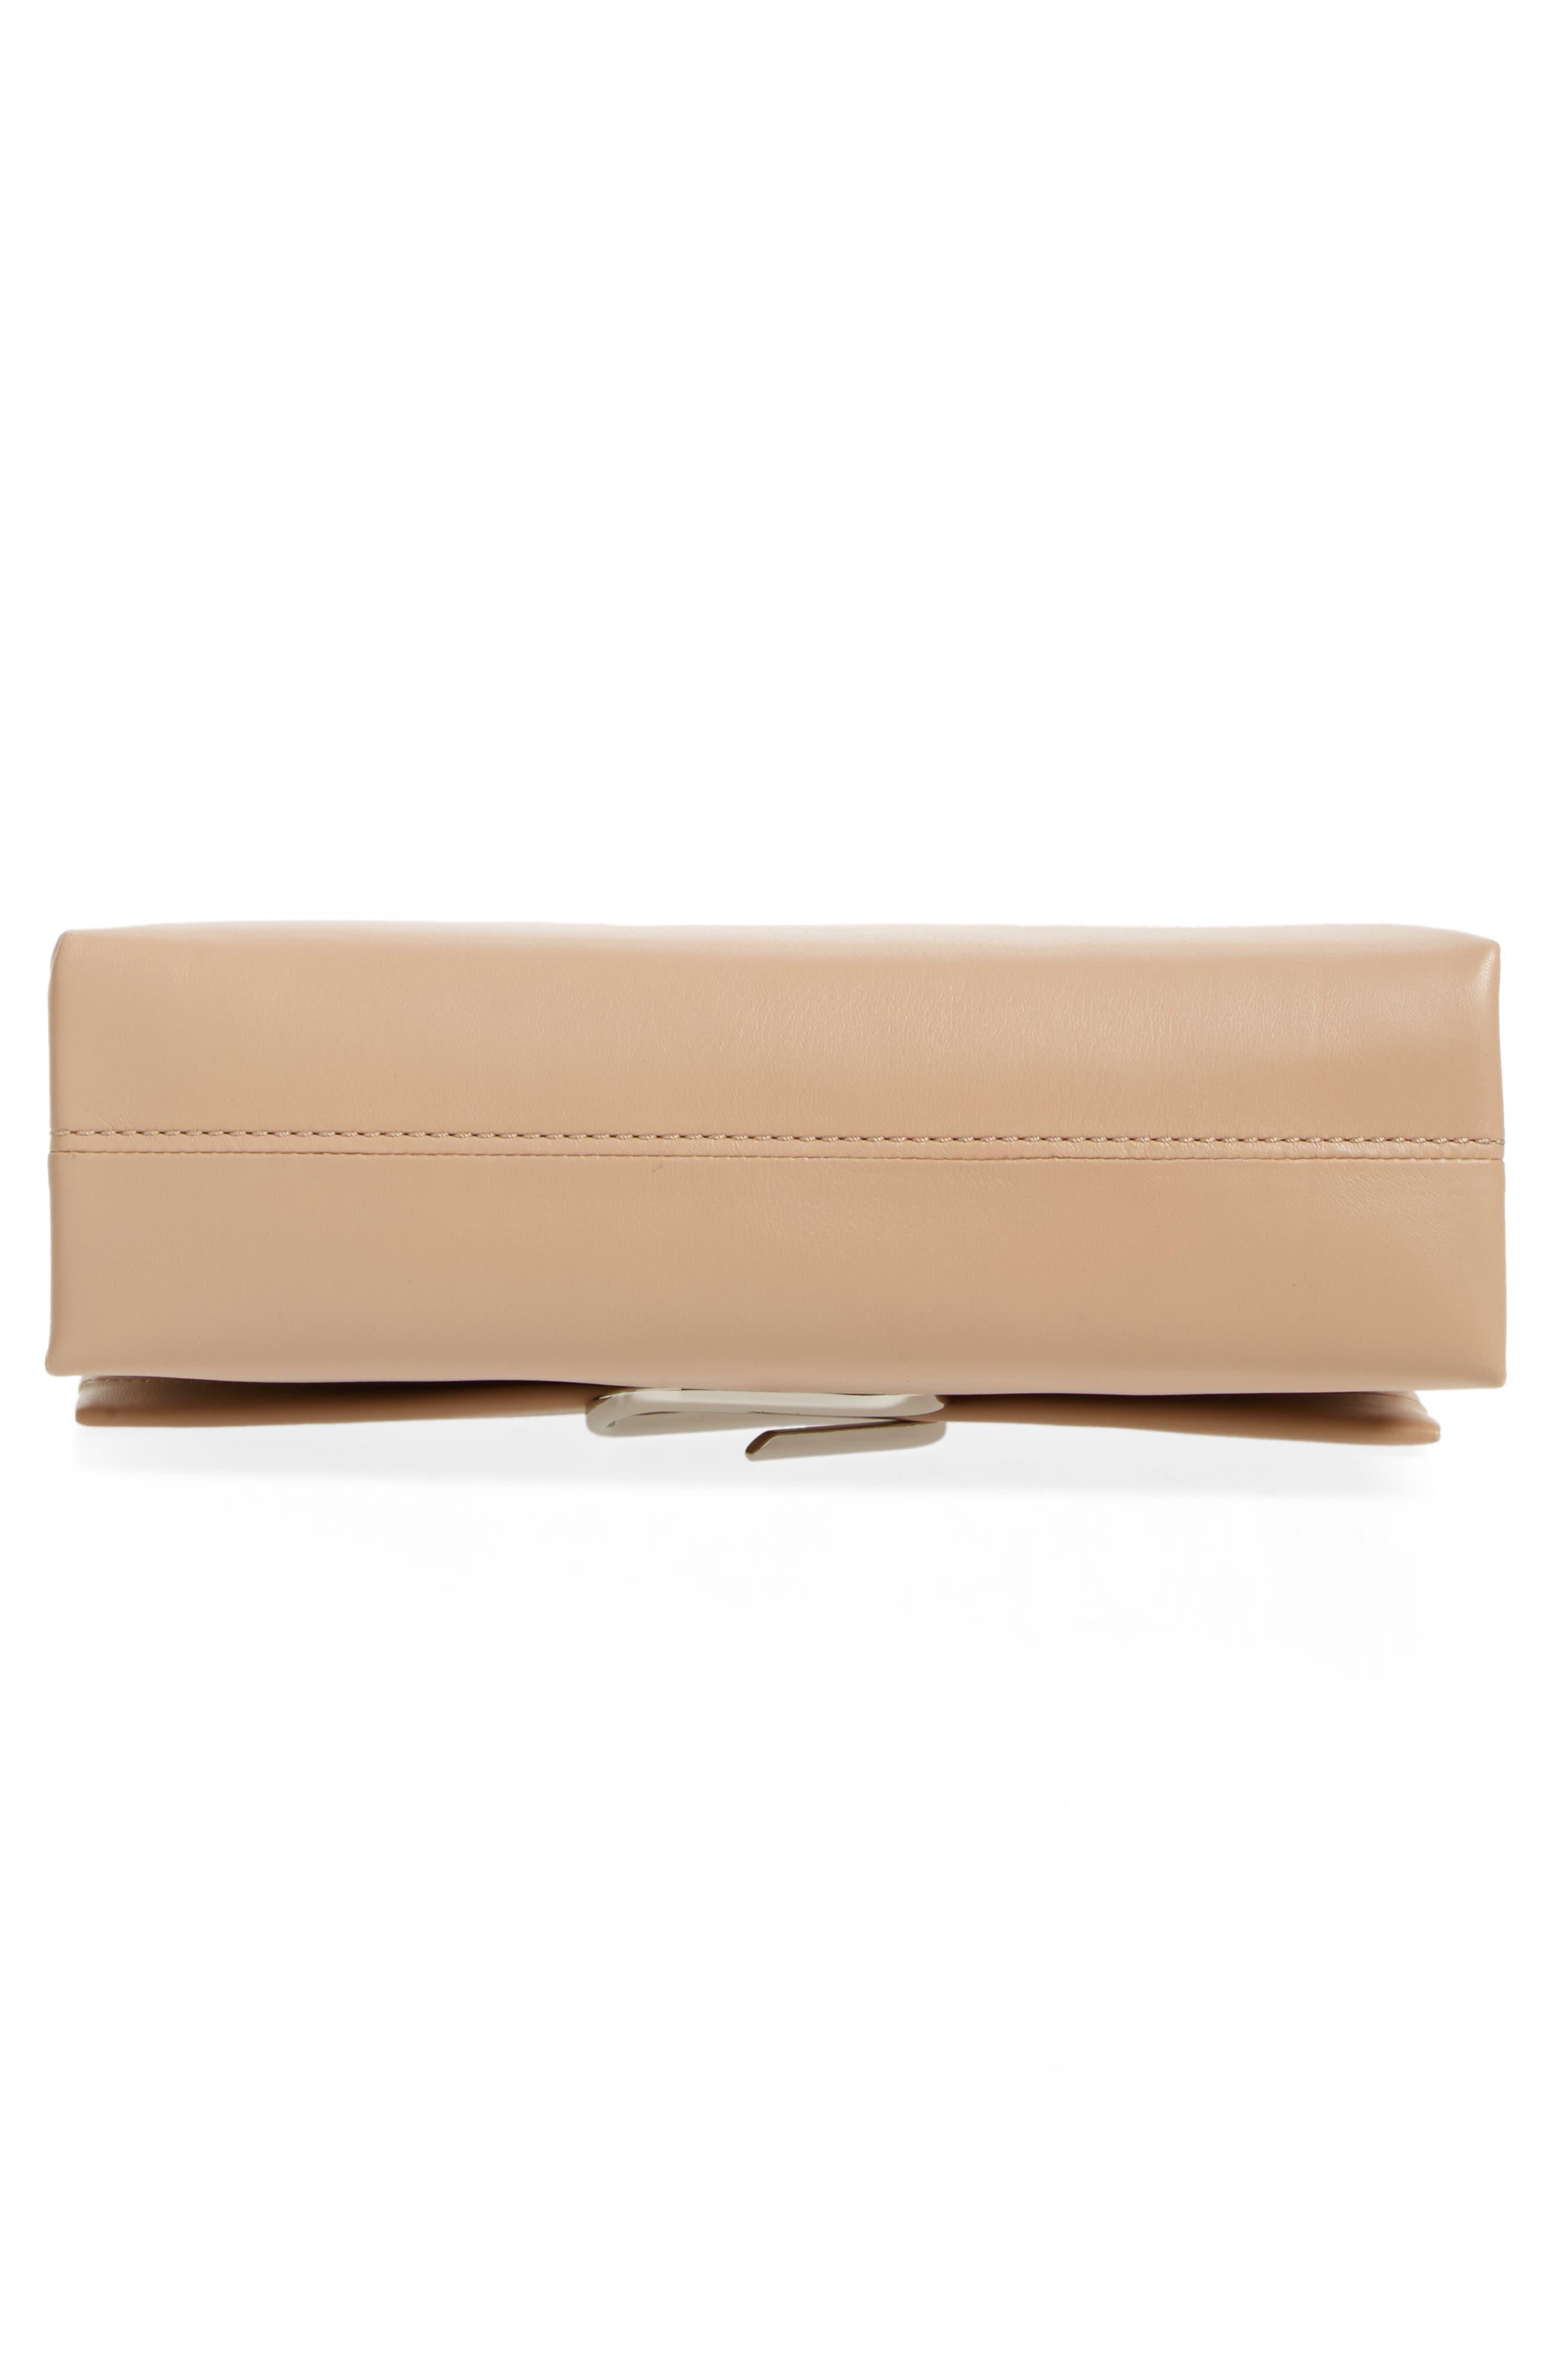 Oversized Alix Flap Leather Shoulder Bag,                             Alternate thumbnail 7, color,                             260